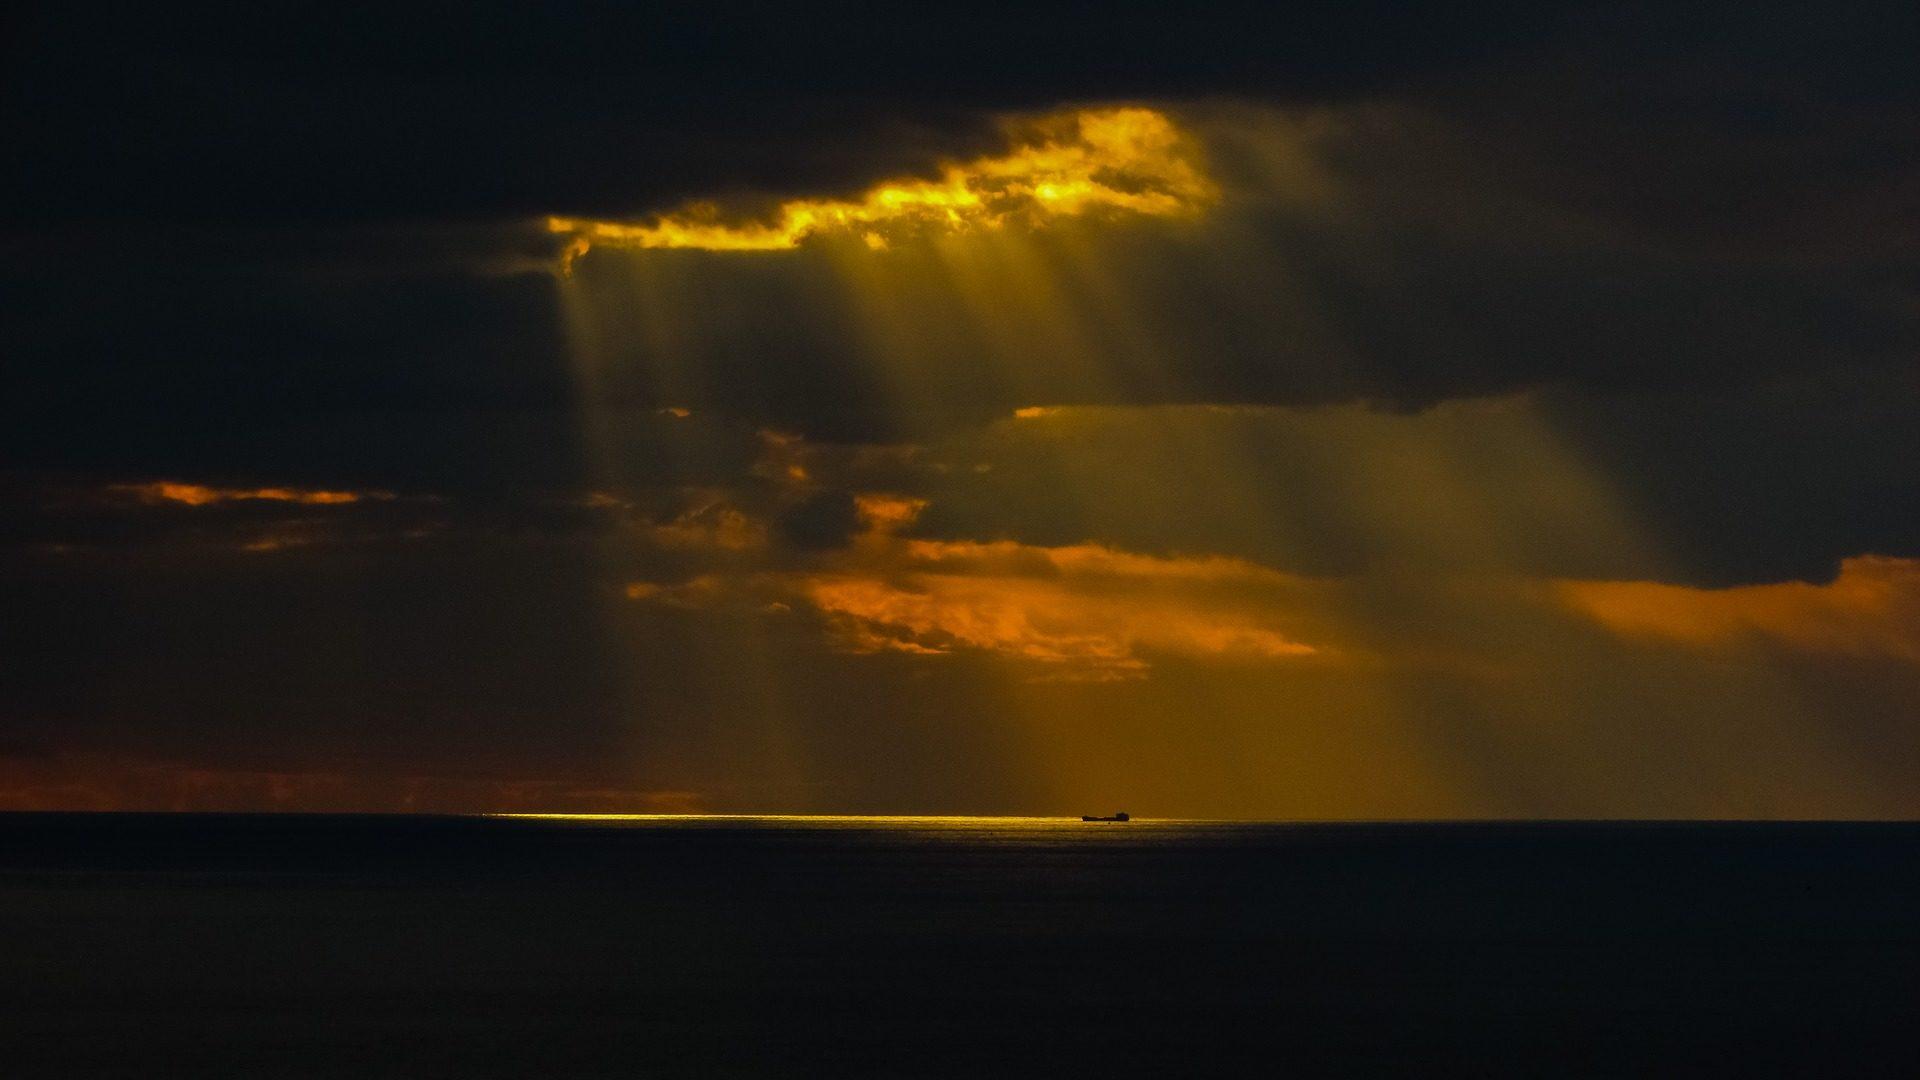 Sonnenuntergang, bewölkt, Strahlen, Sonne, Halos, Horizont - Wallpaper HD - Prof.-falken.com